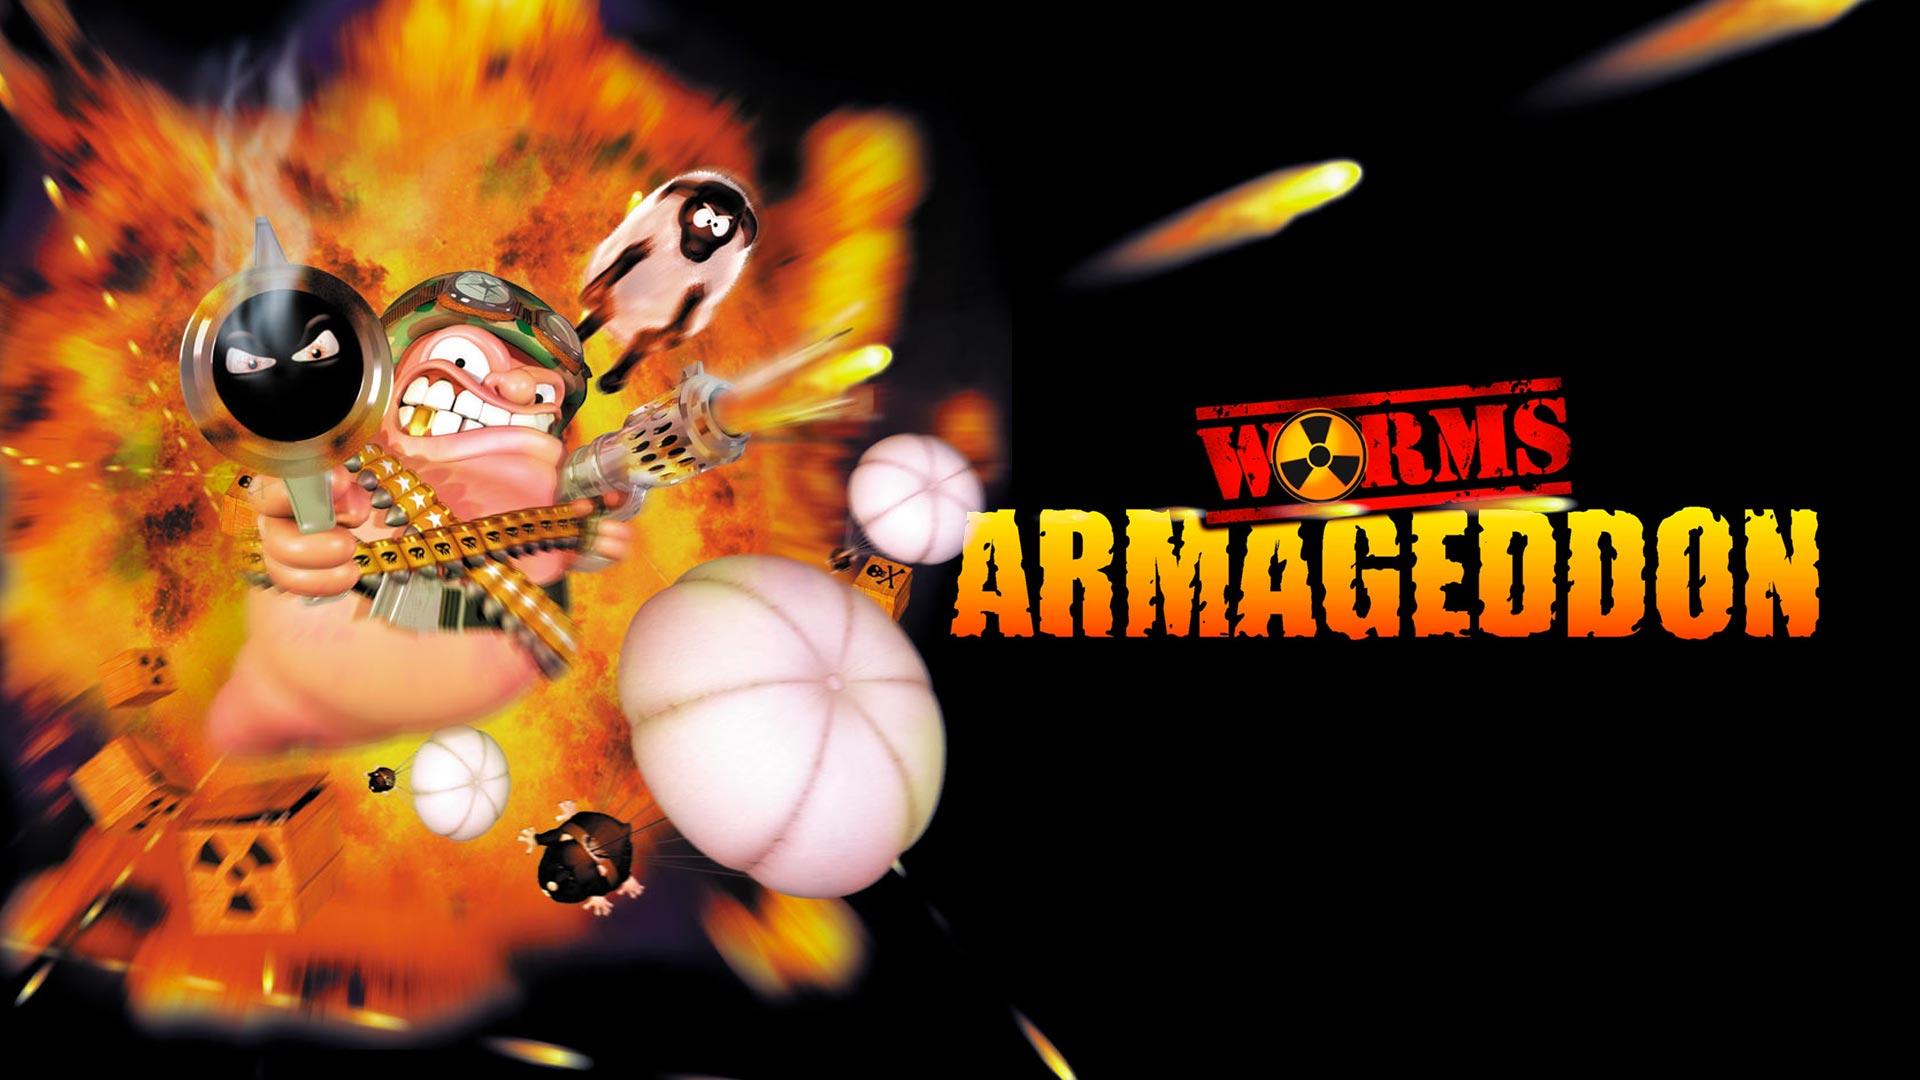 Worms Armageddon Team17 Group Plc